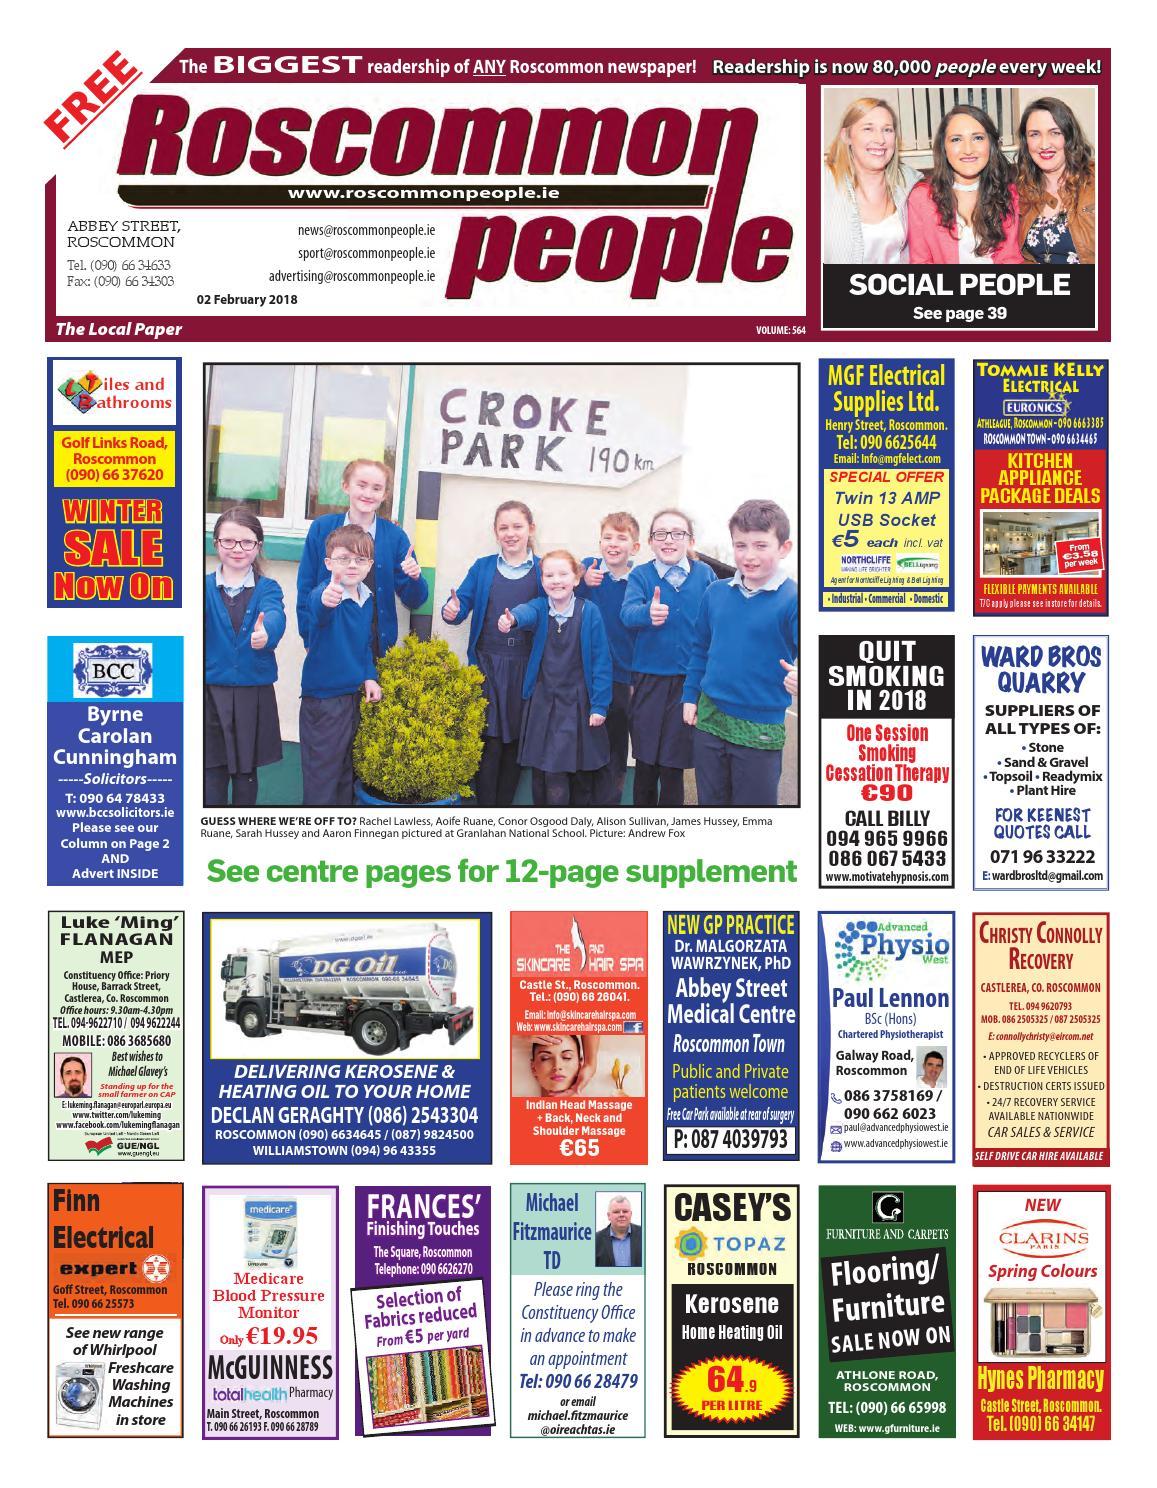 Tinder Safety - sil0.co.uk - Irelands Youth Information Website